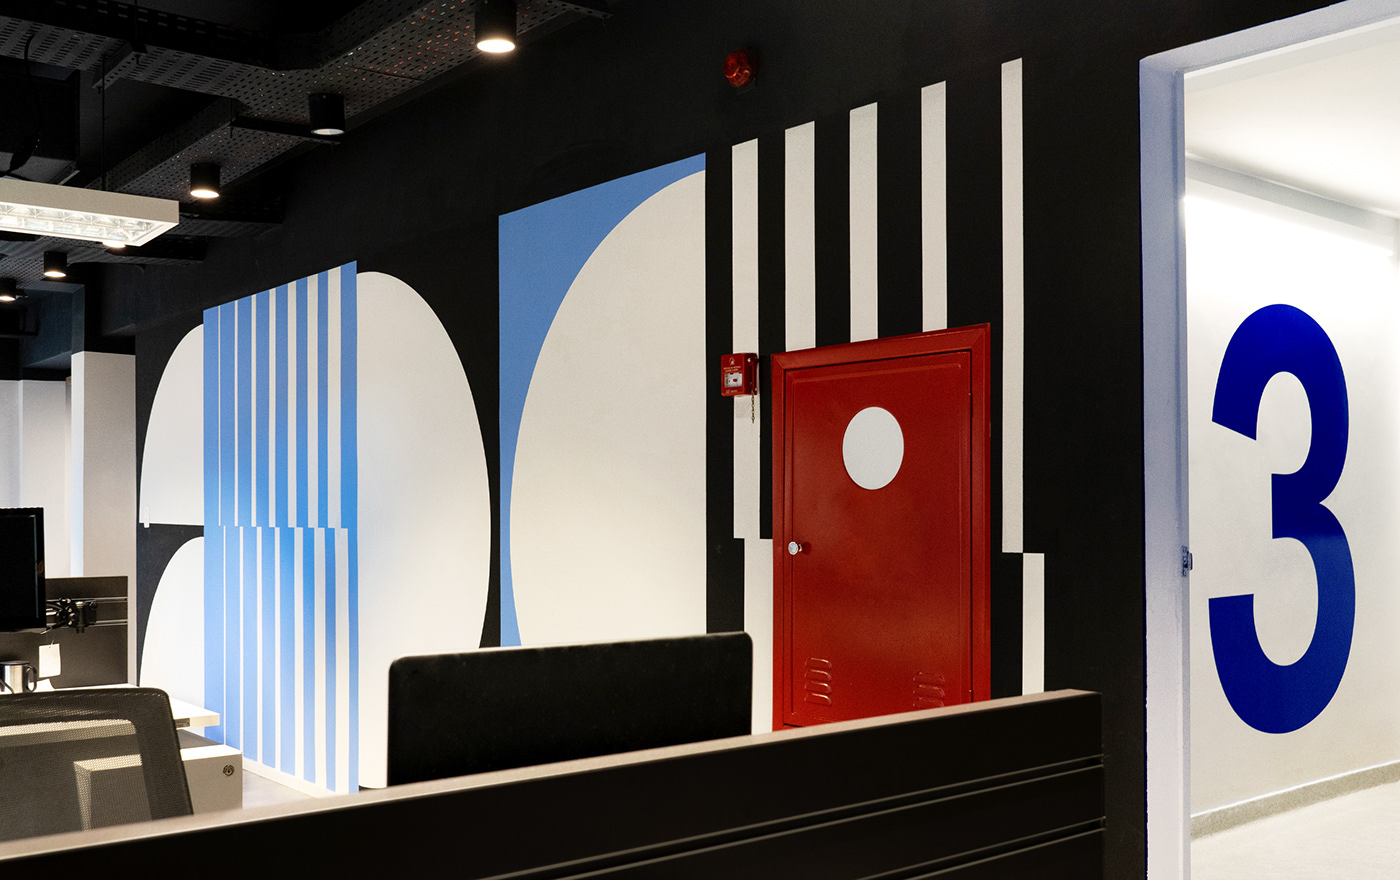 environmental graphic graphic design  interiors Mural Signage wall wayfinding